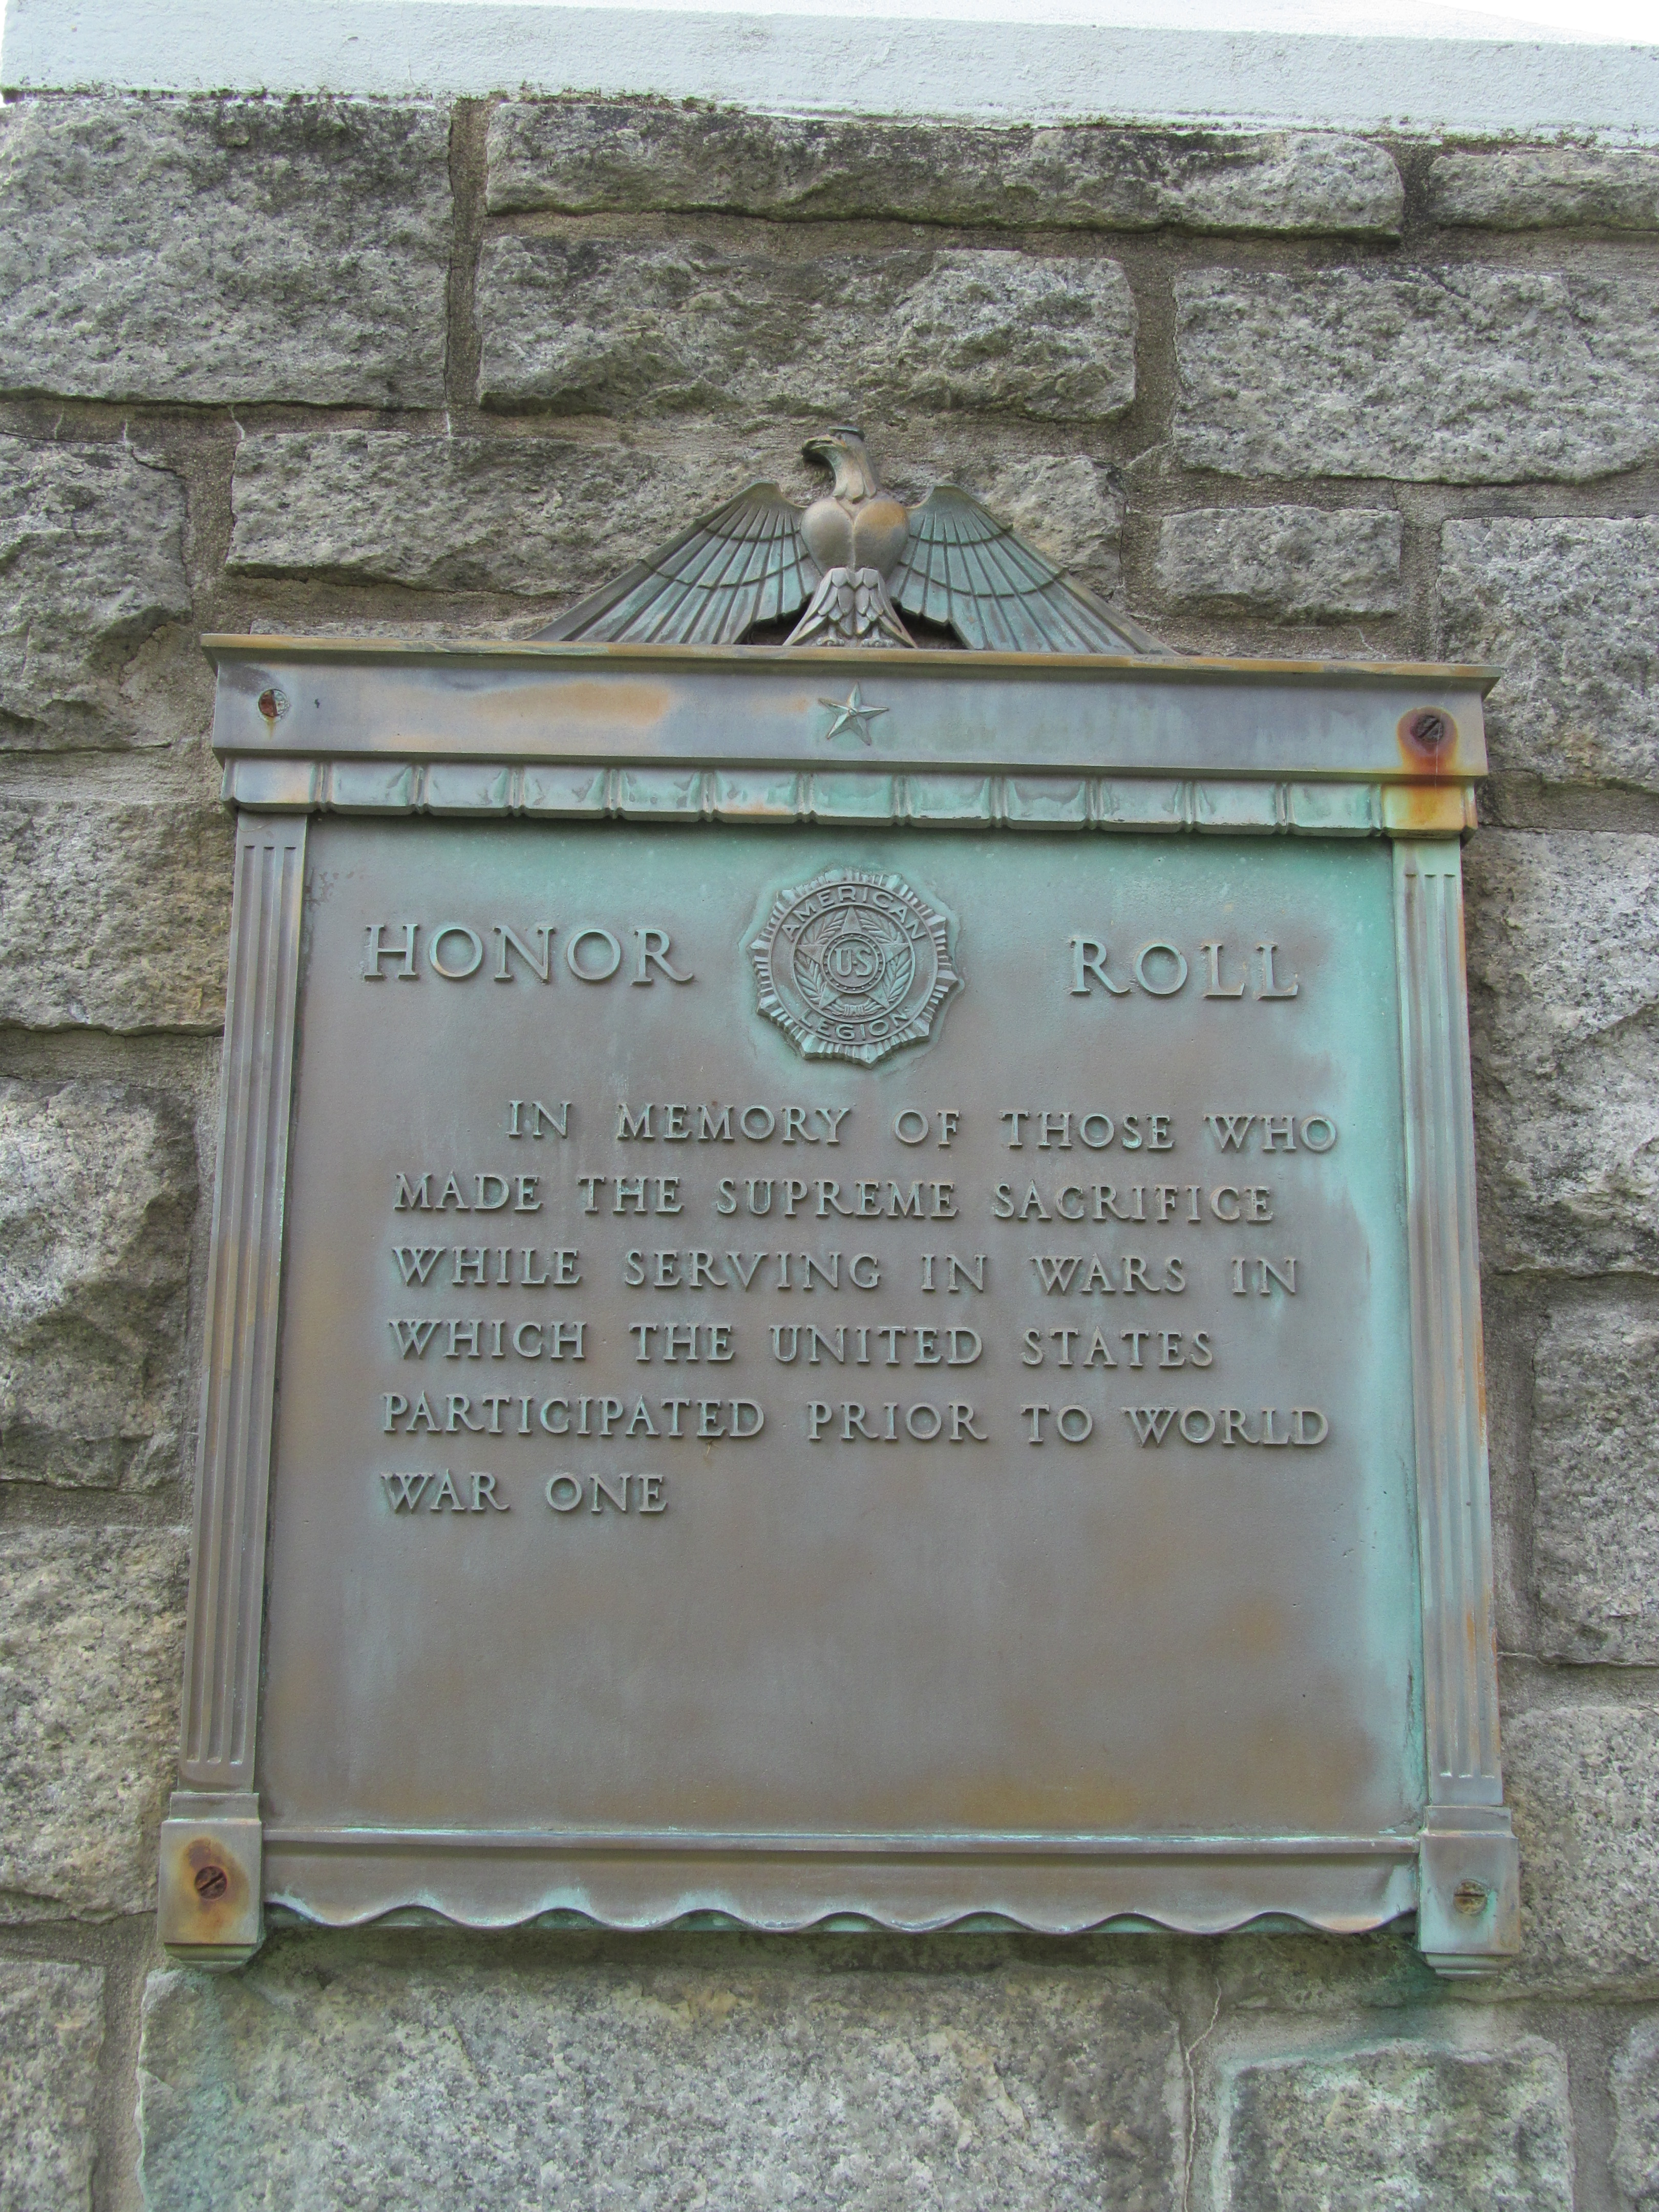 detail of plaque honoring veterans of prior wars